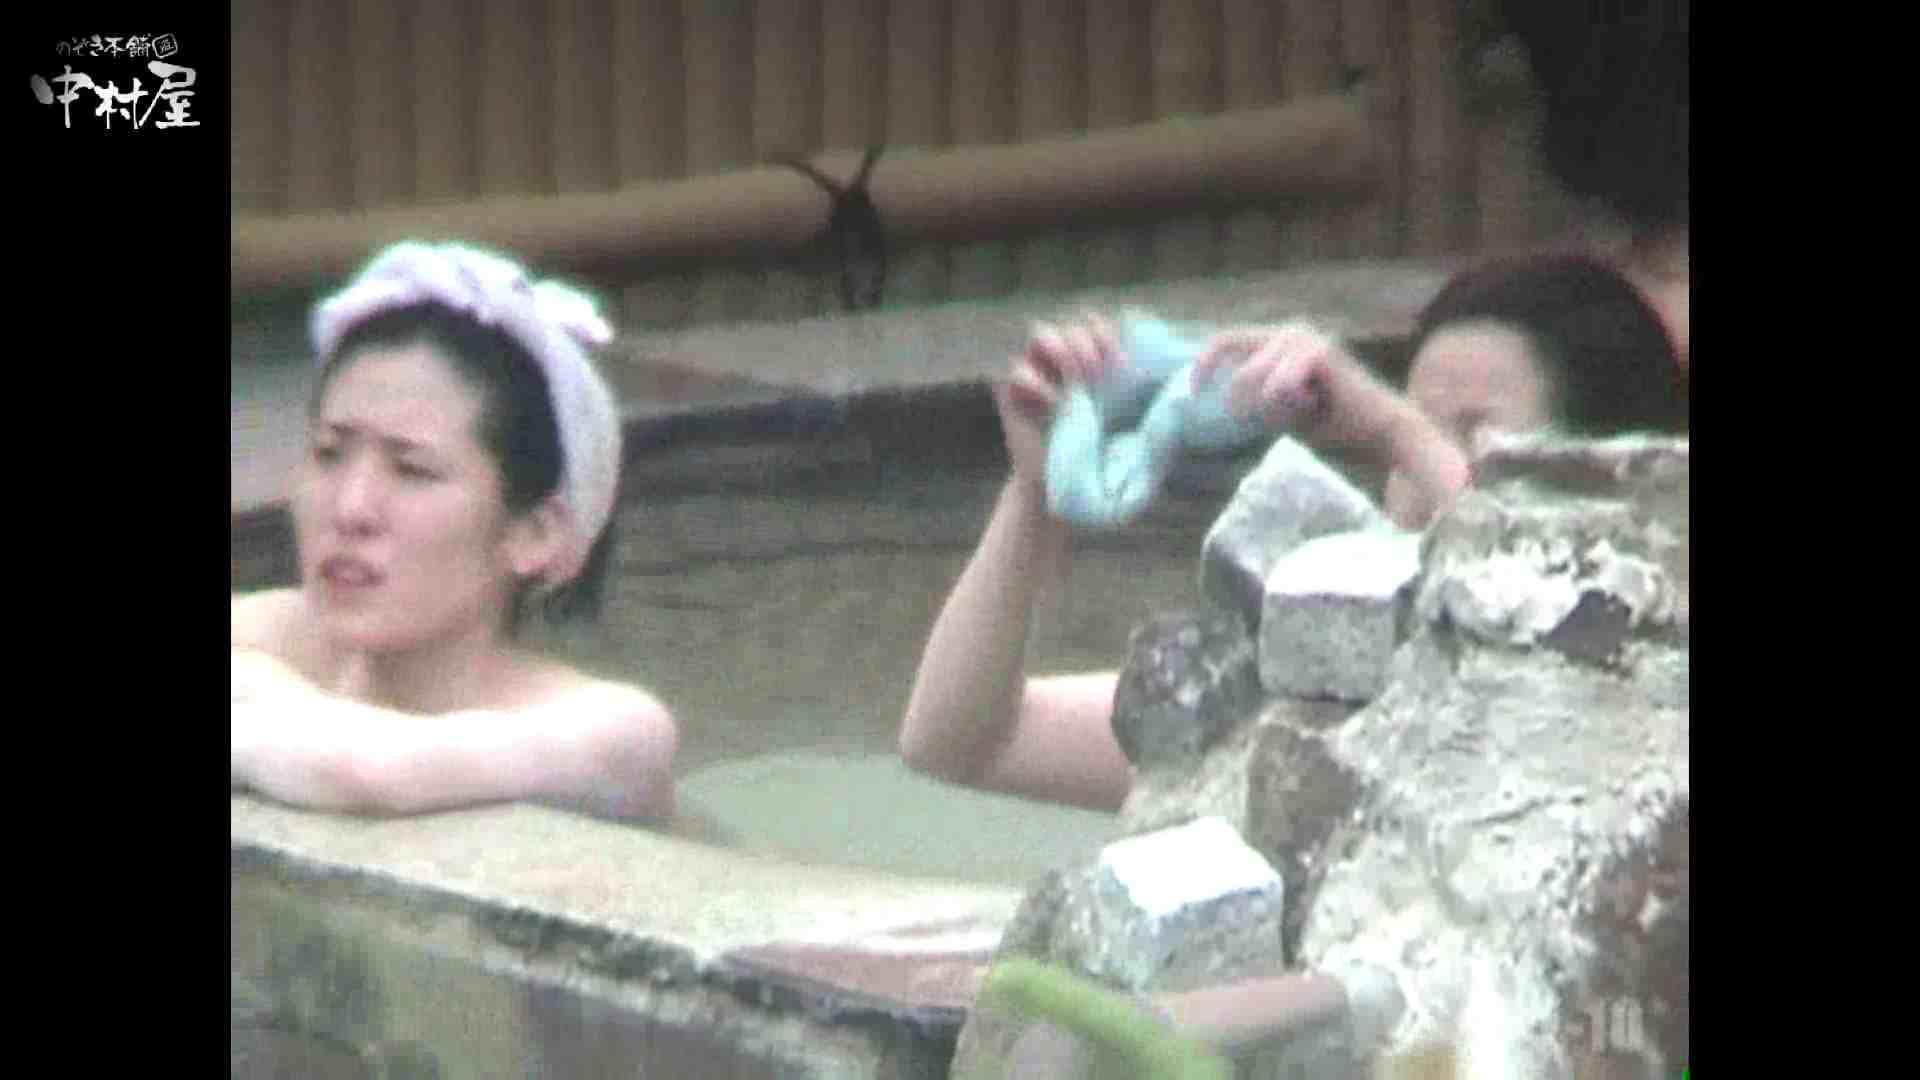 Aquaな露天風呂Vol.874潜入盗撮露天風呂十判湯 其の四 露天 オメコ動画キャプチャ 108画像 67